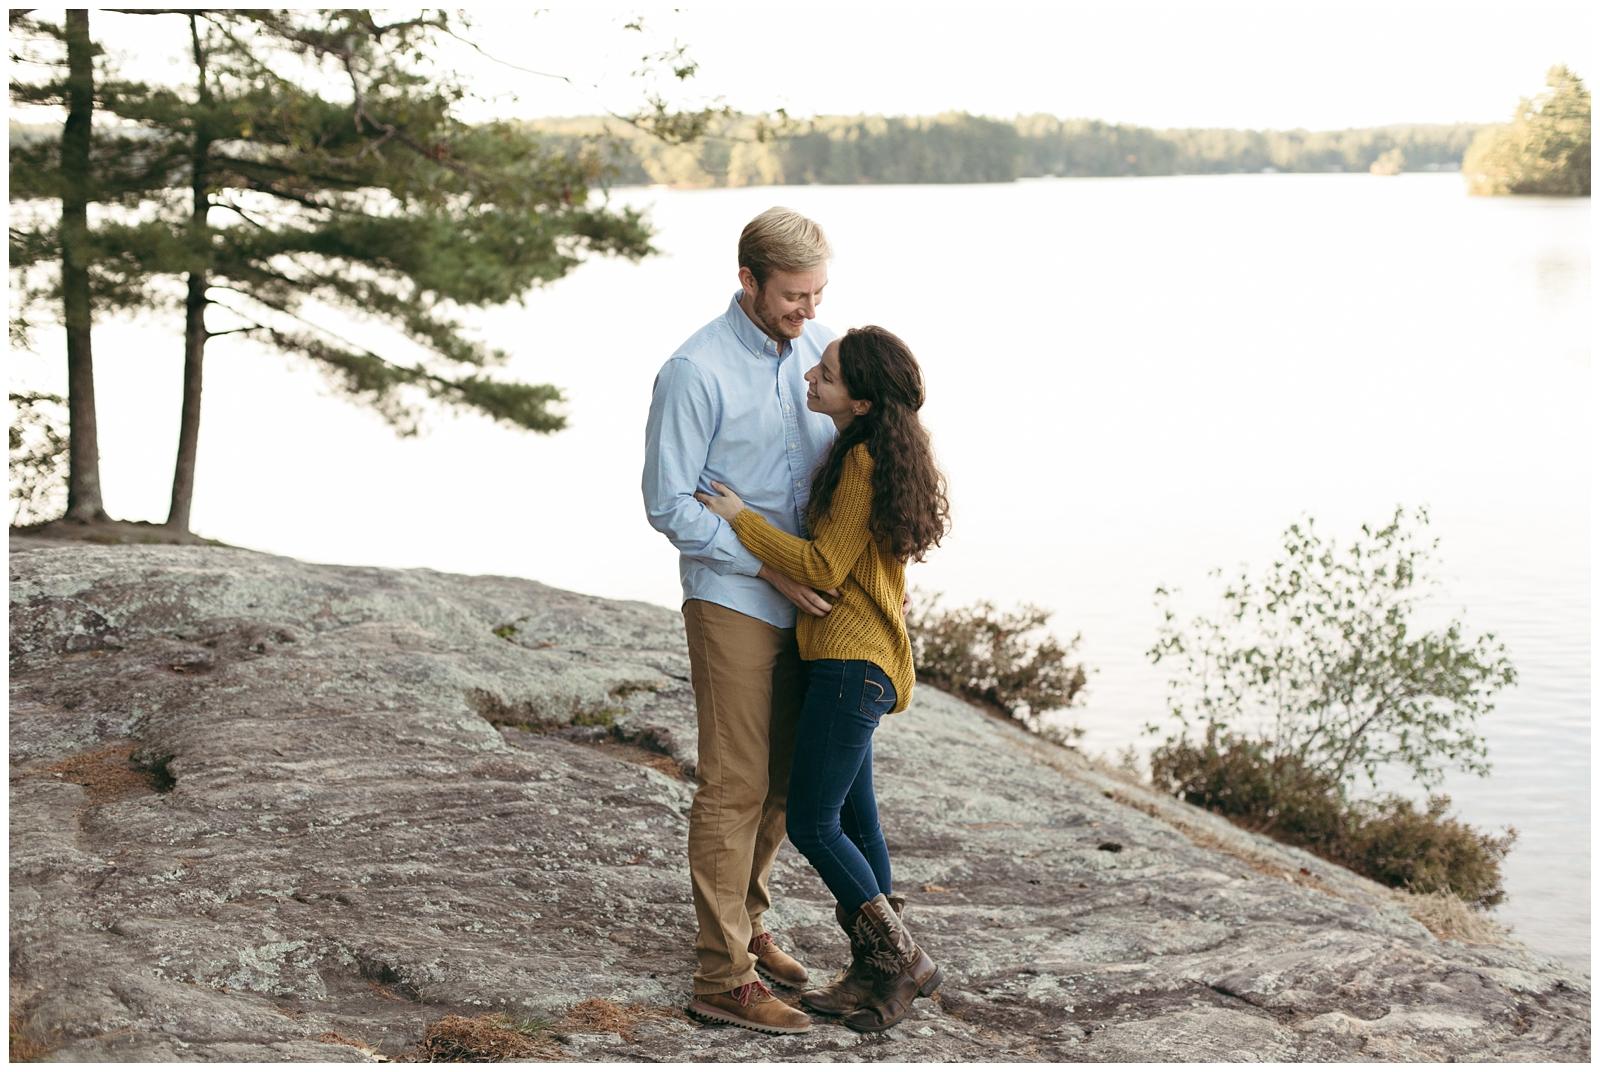 Connecticut-Engagement-Photographer-Bailey-Q-Photo-19.jpg